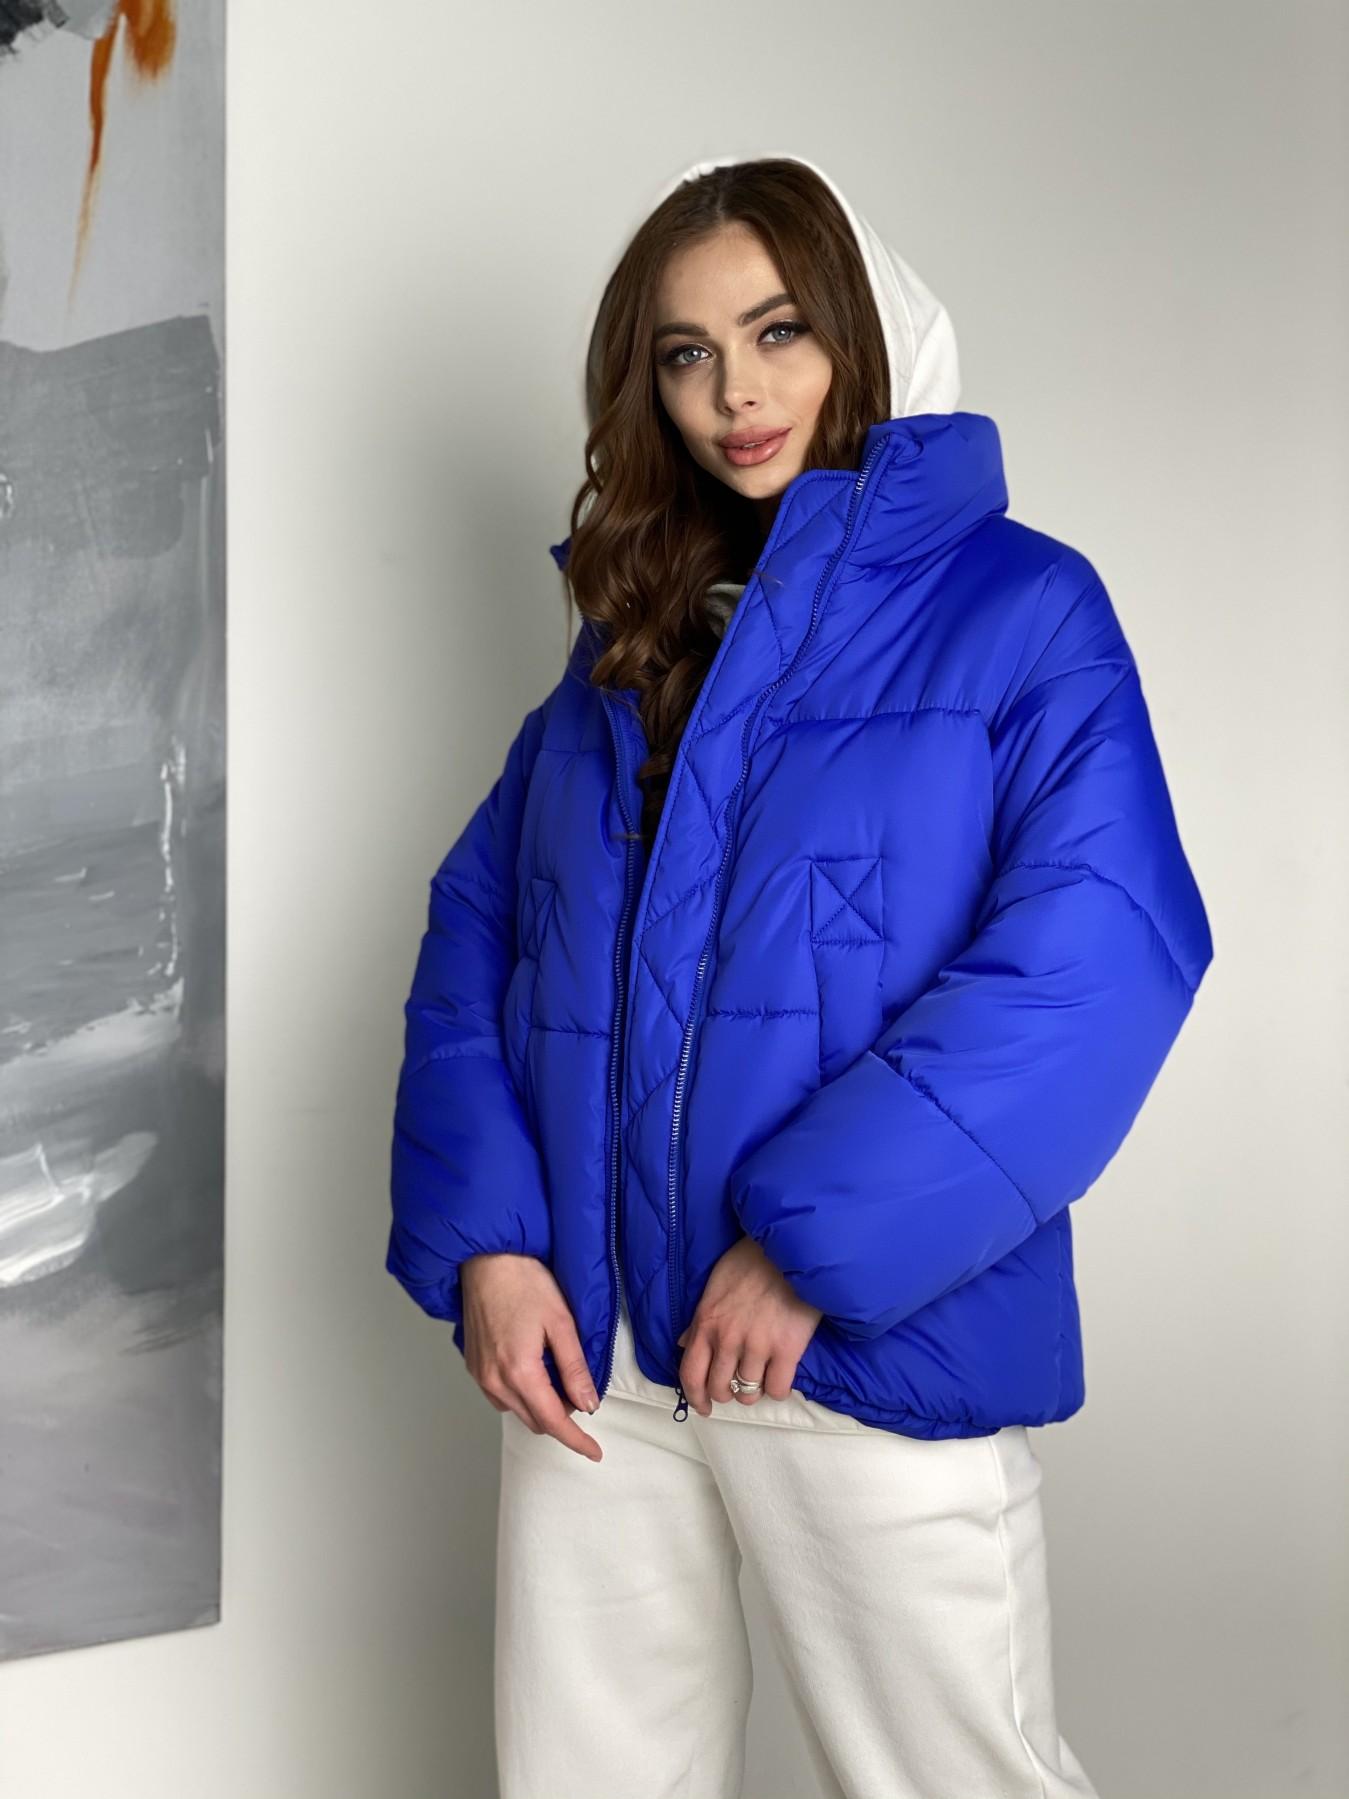 Муд куртка из плащевой ткани 10509 АРТ. 46852 Цвет: Электрик - фото 8, интернет магазин tm-modus.ru